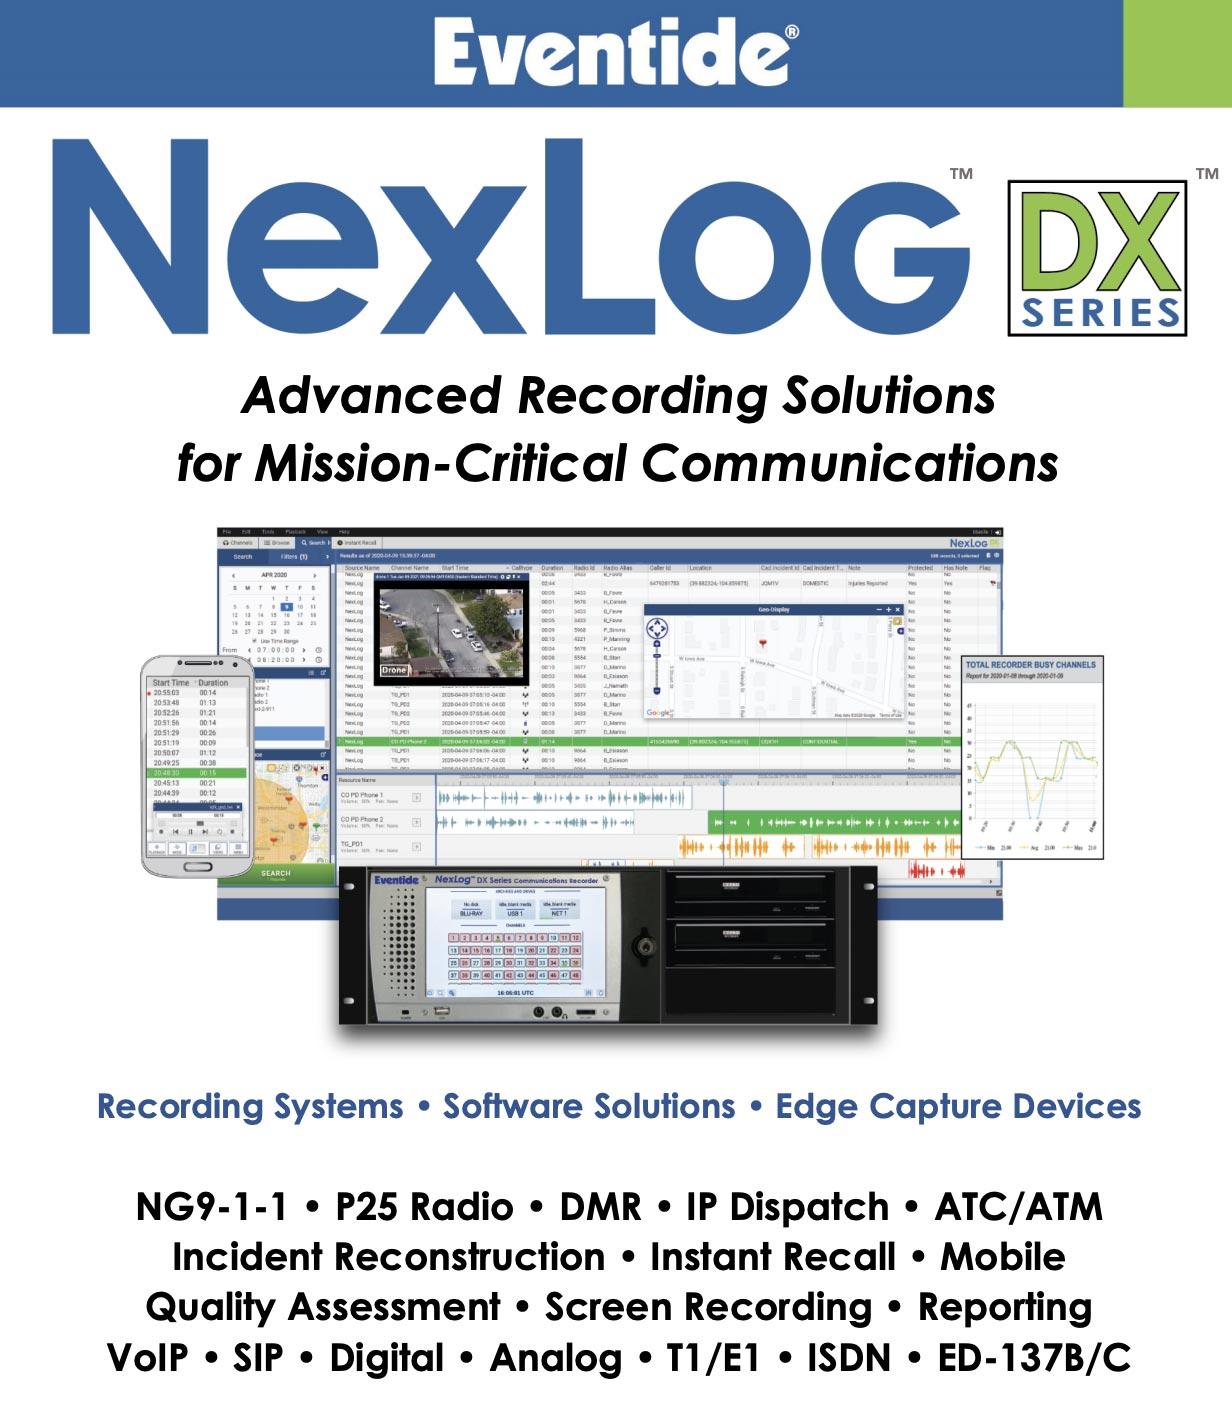 EvenTide NexLog DX Series (PDF)